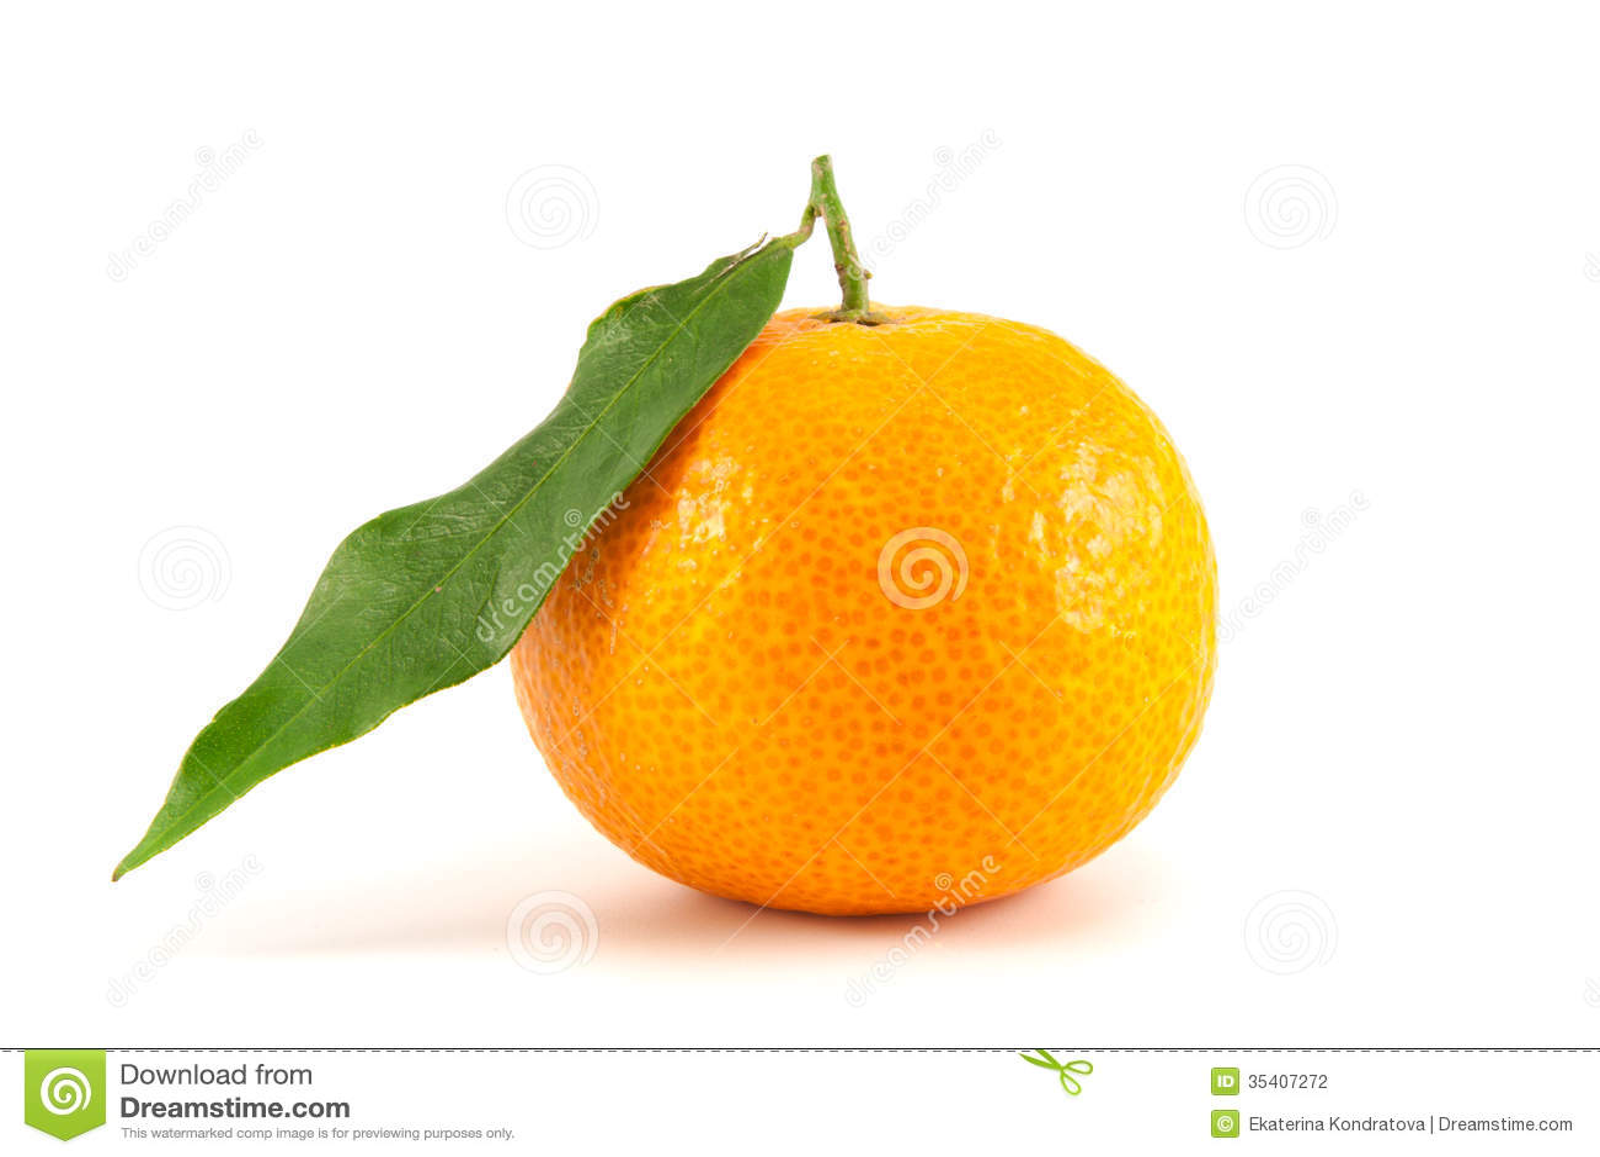 mandarine orange avec la feuille photo stock image du fruits centrales 35407272. Black Bedroom Furniture Sets. Home Design Ideas